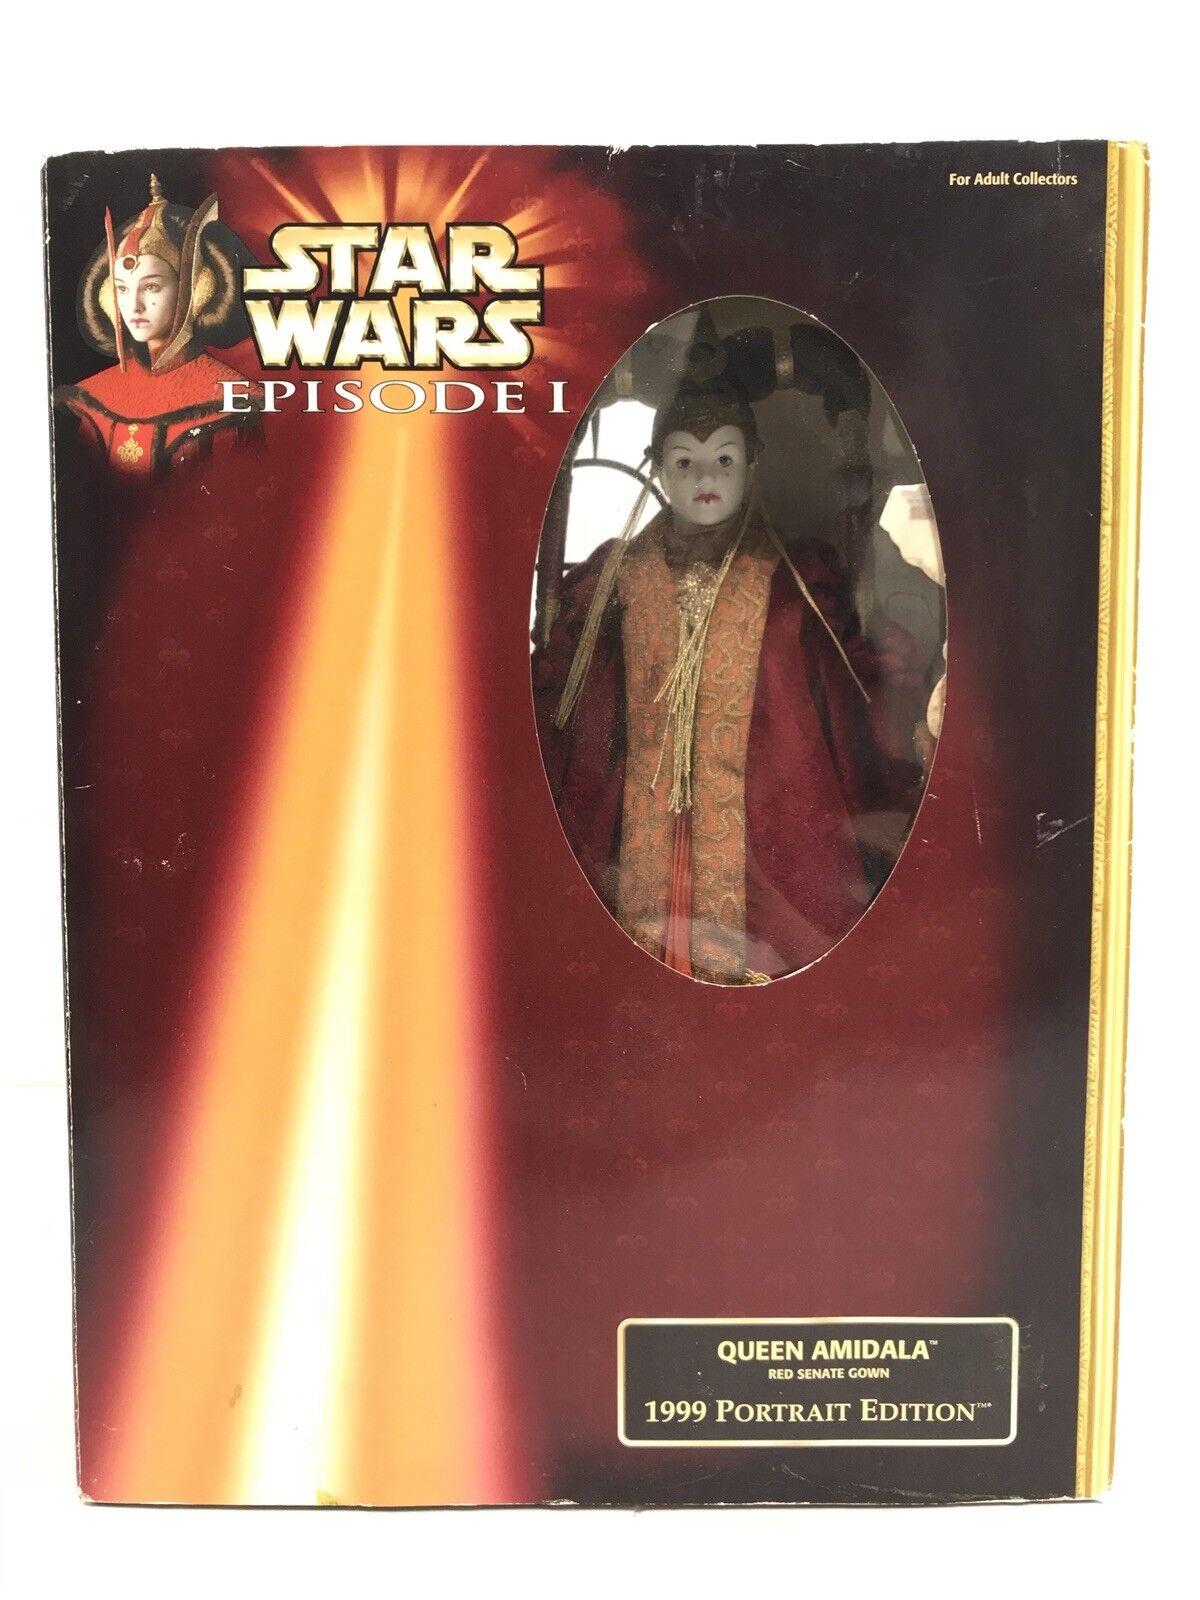 Queen Amidala 1999 Portrait Edition Collectors Doll Figure Star Wars NEW Hasbro